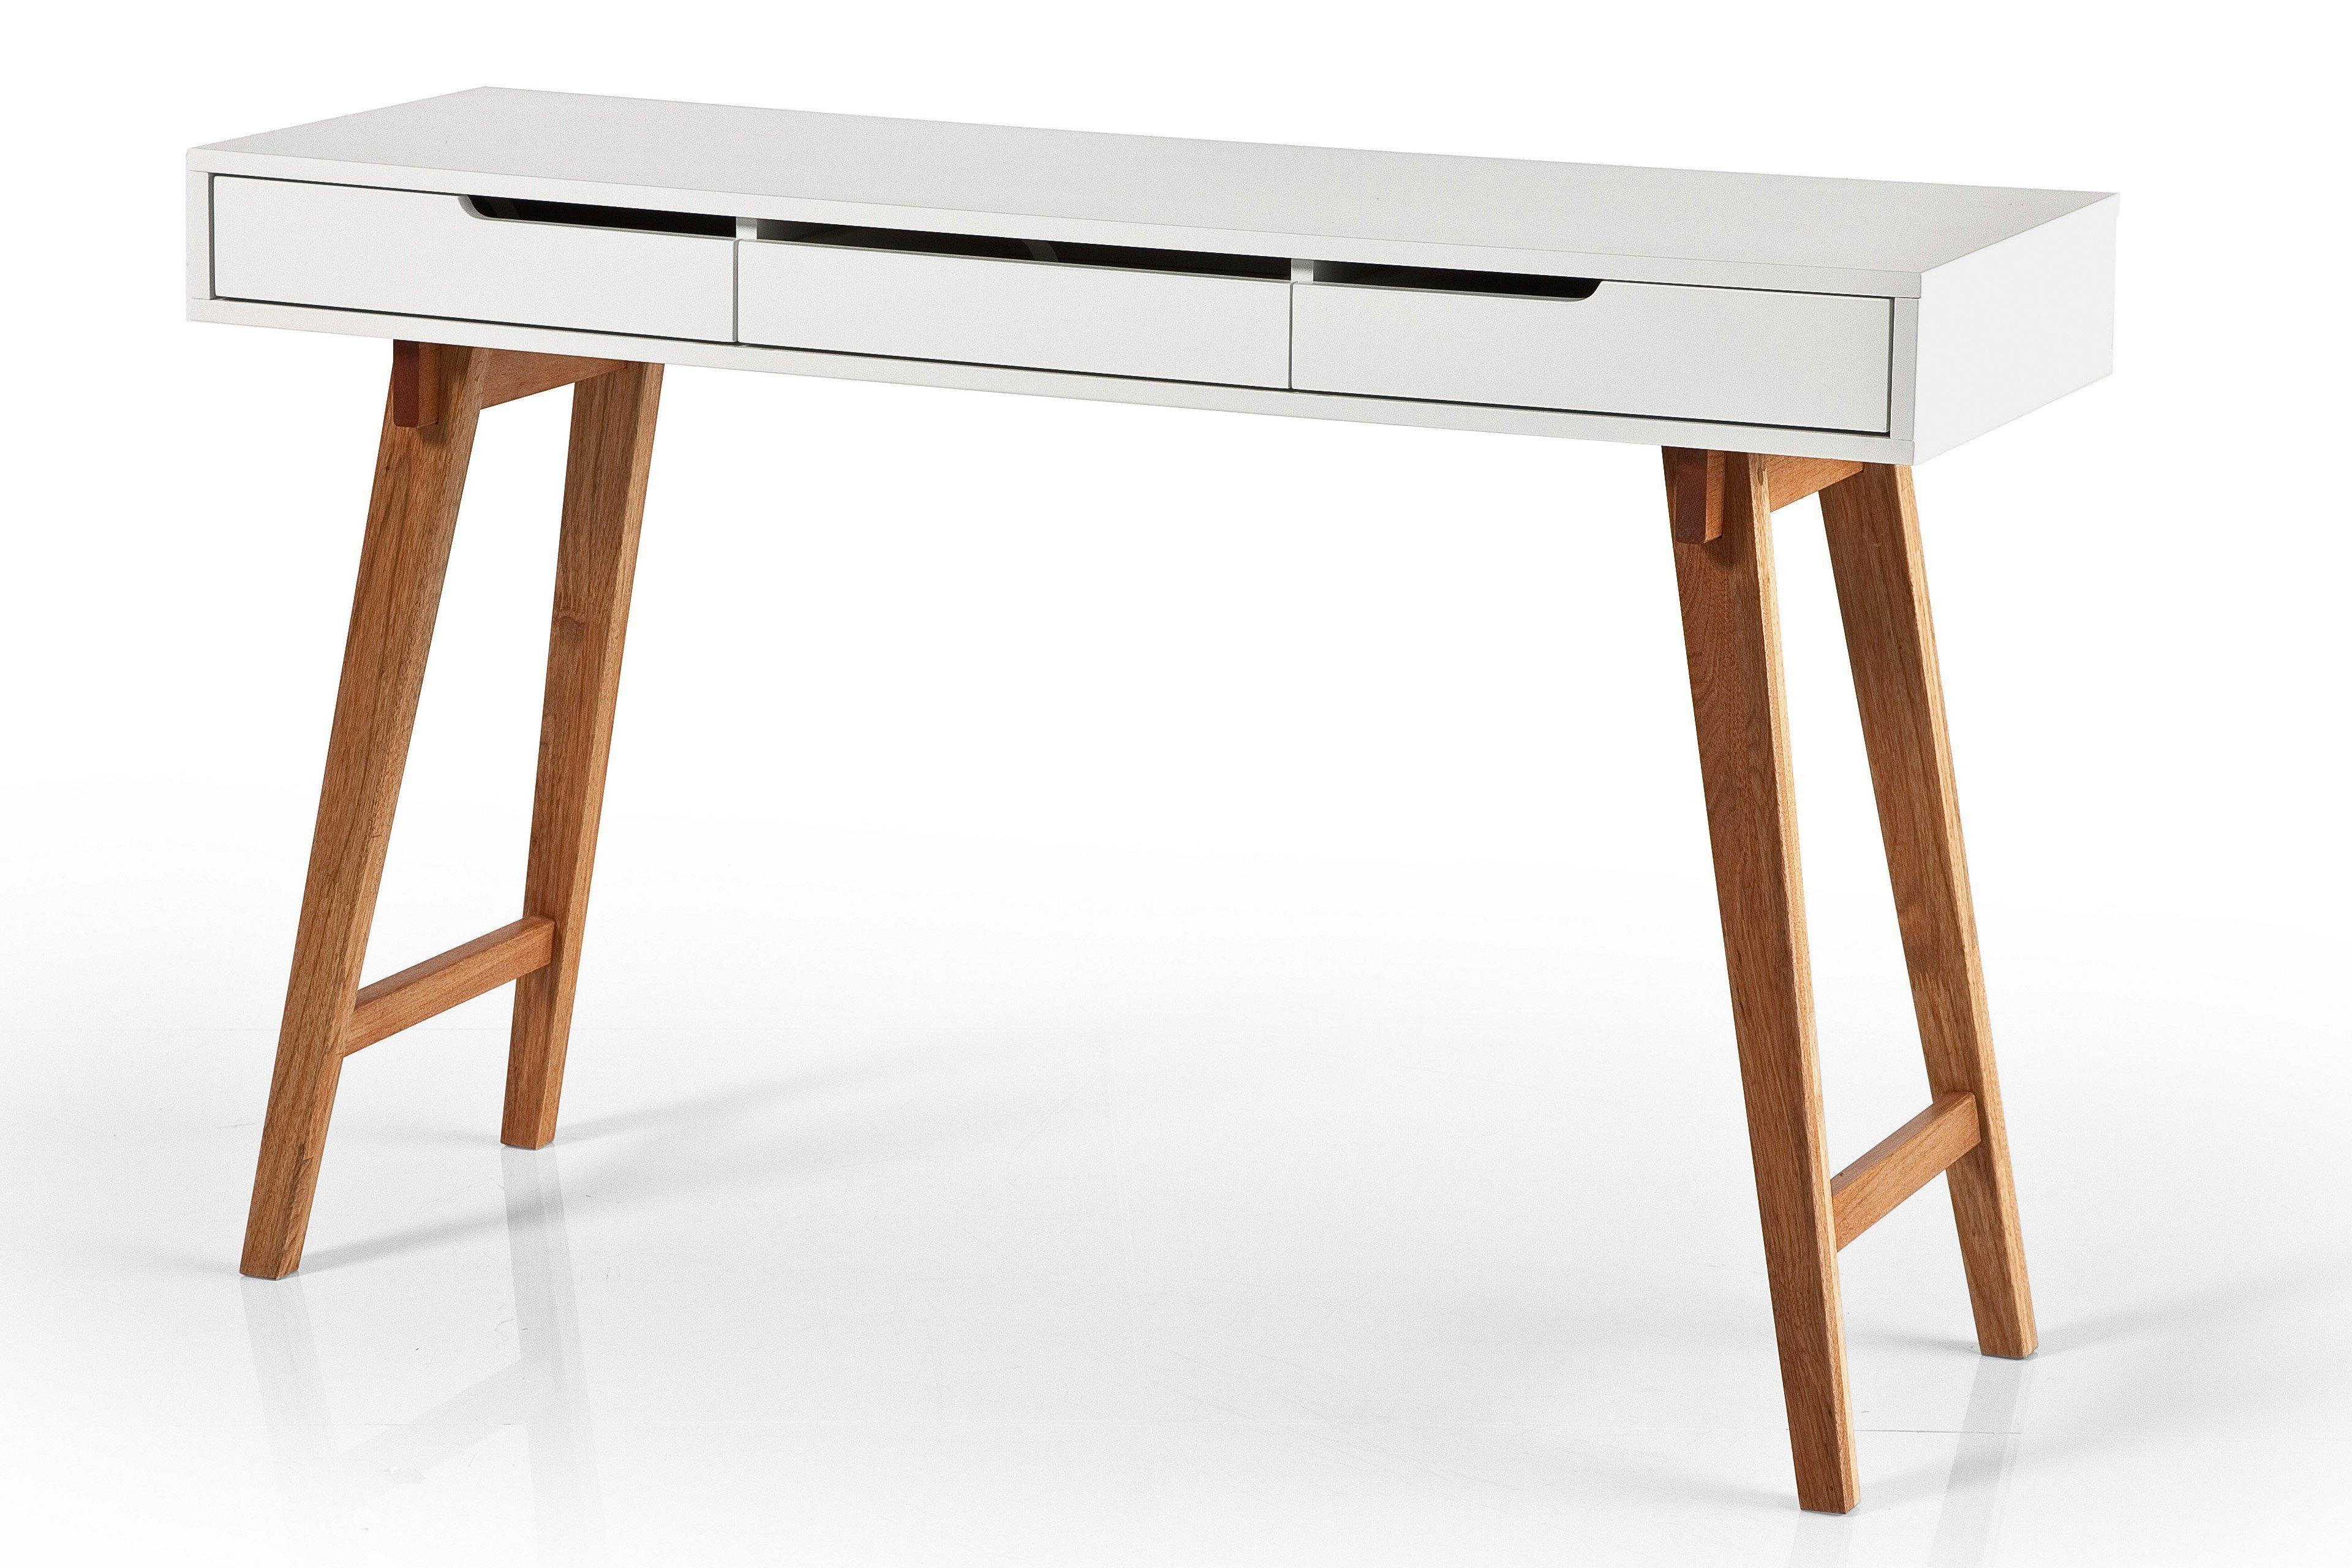 skandinavische konsole andri wei matt buche m bel letz ihr online shop. Black Bedroom Furniture Sets. Home Design Ideas